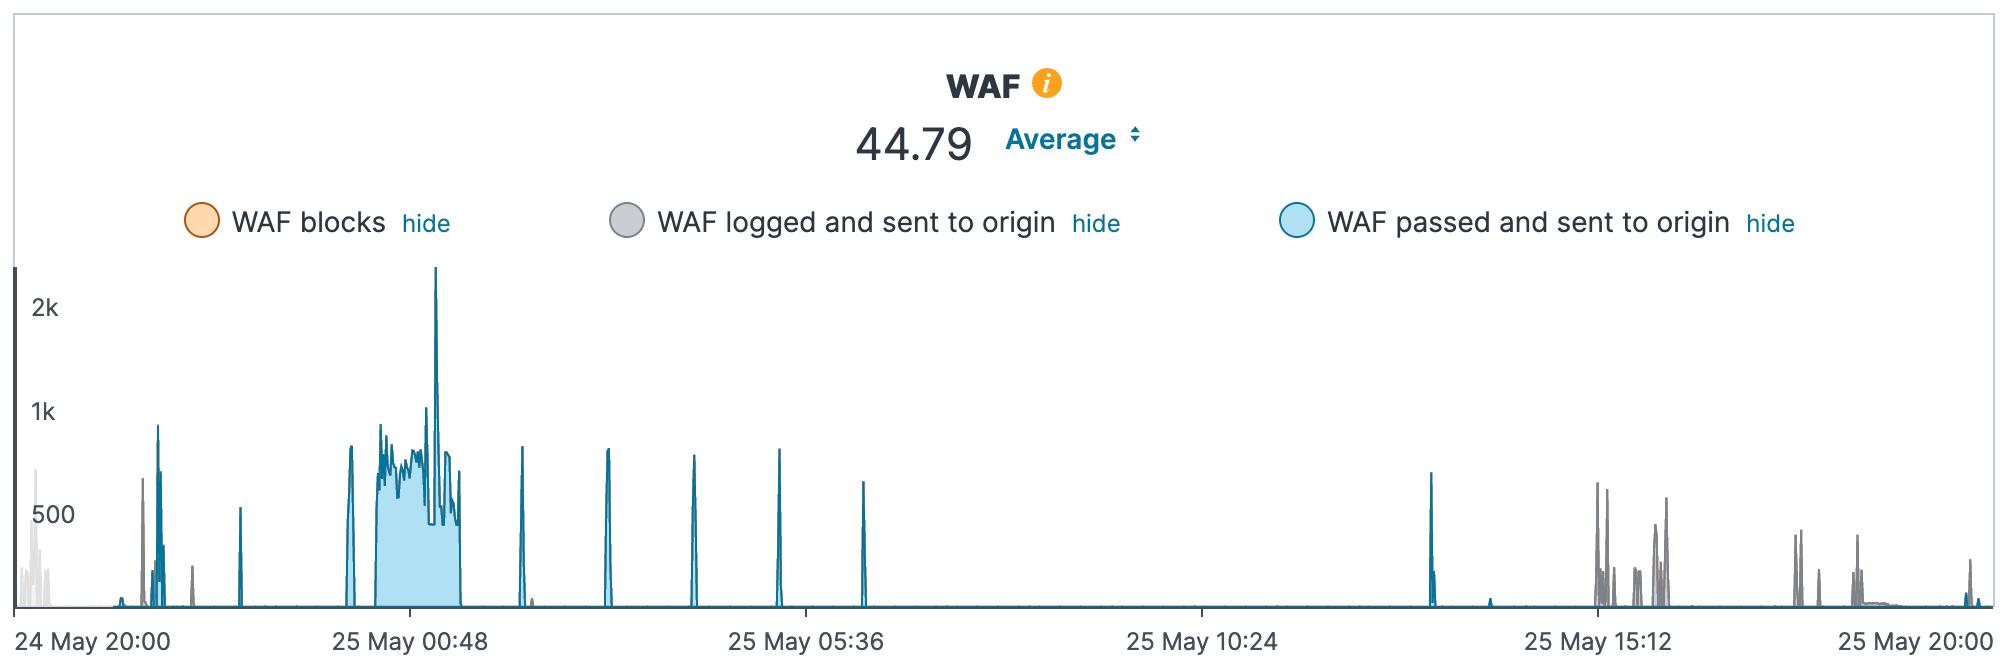 WAF historical stats